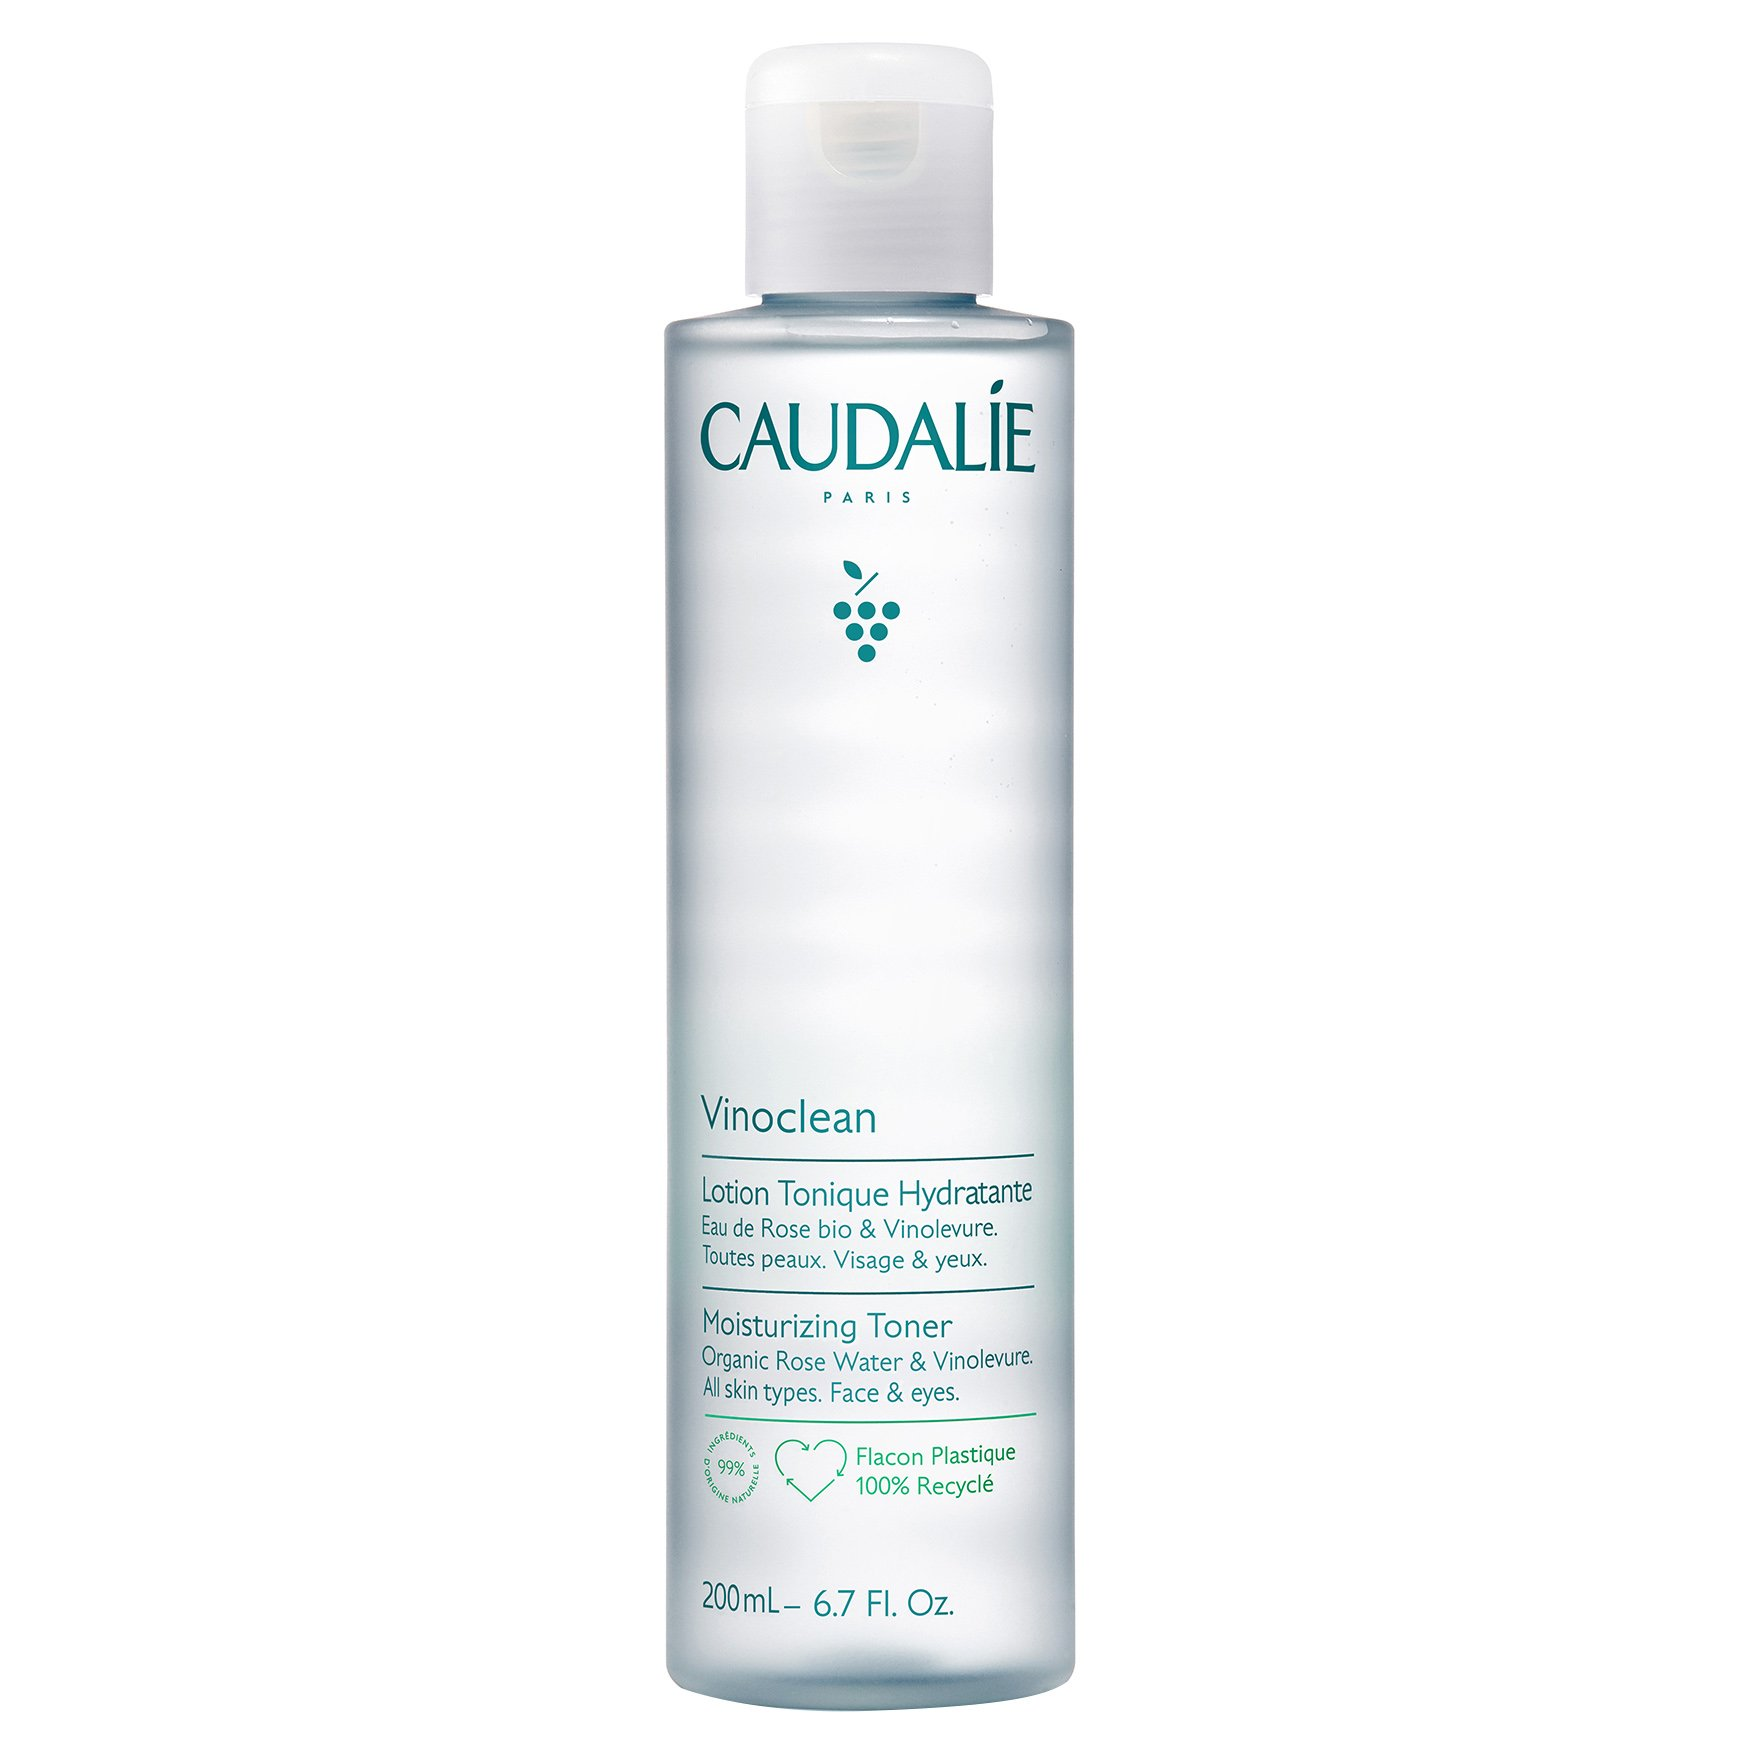 Caudalie Vinoclean Lotion Tonique Hydrante Ενυδατική Τονωτική Λοσιόν 200ml